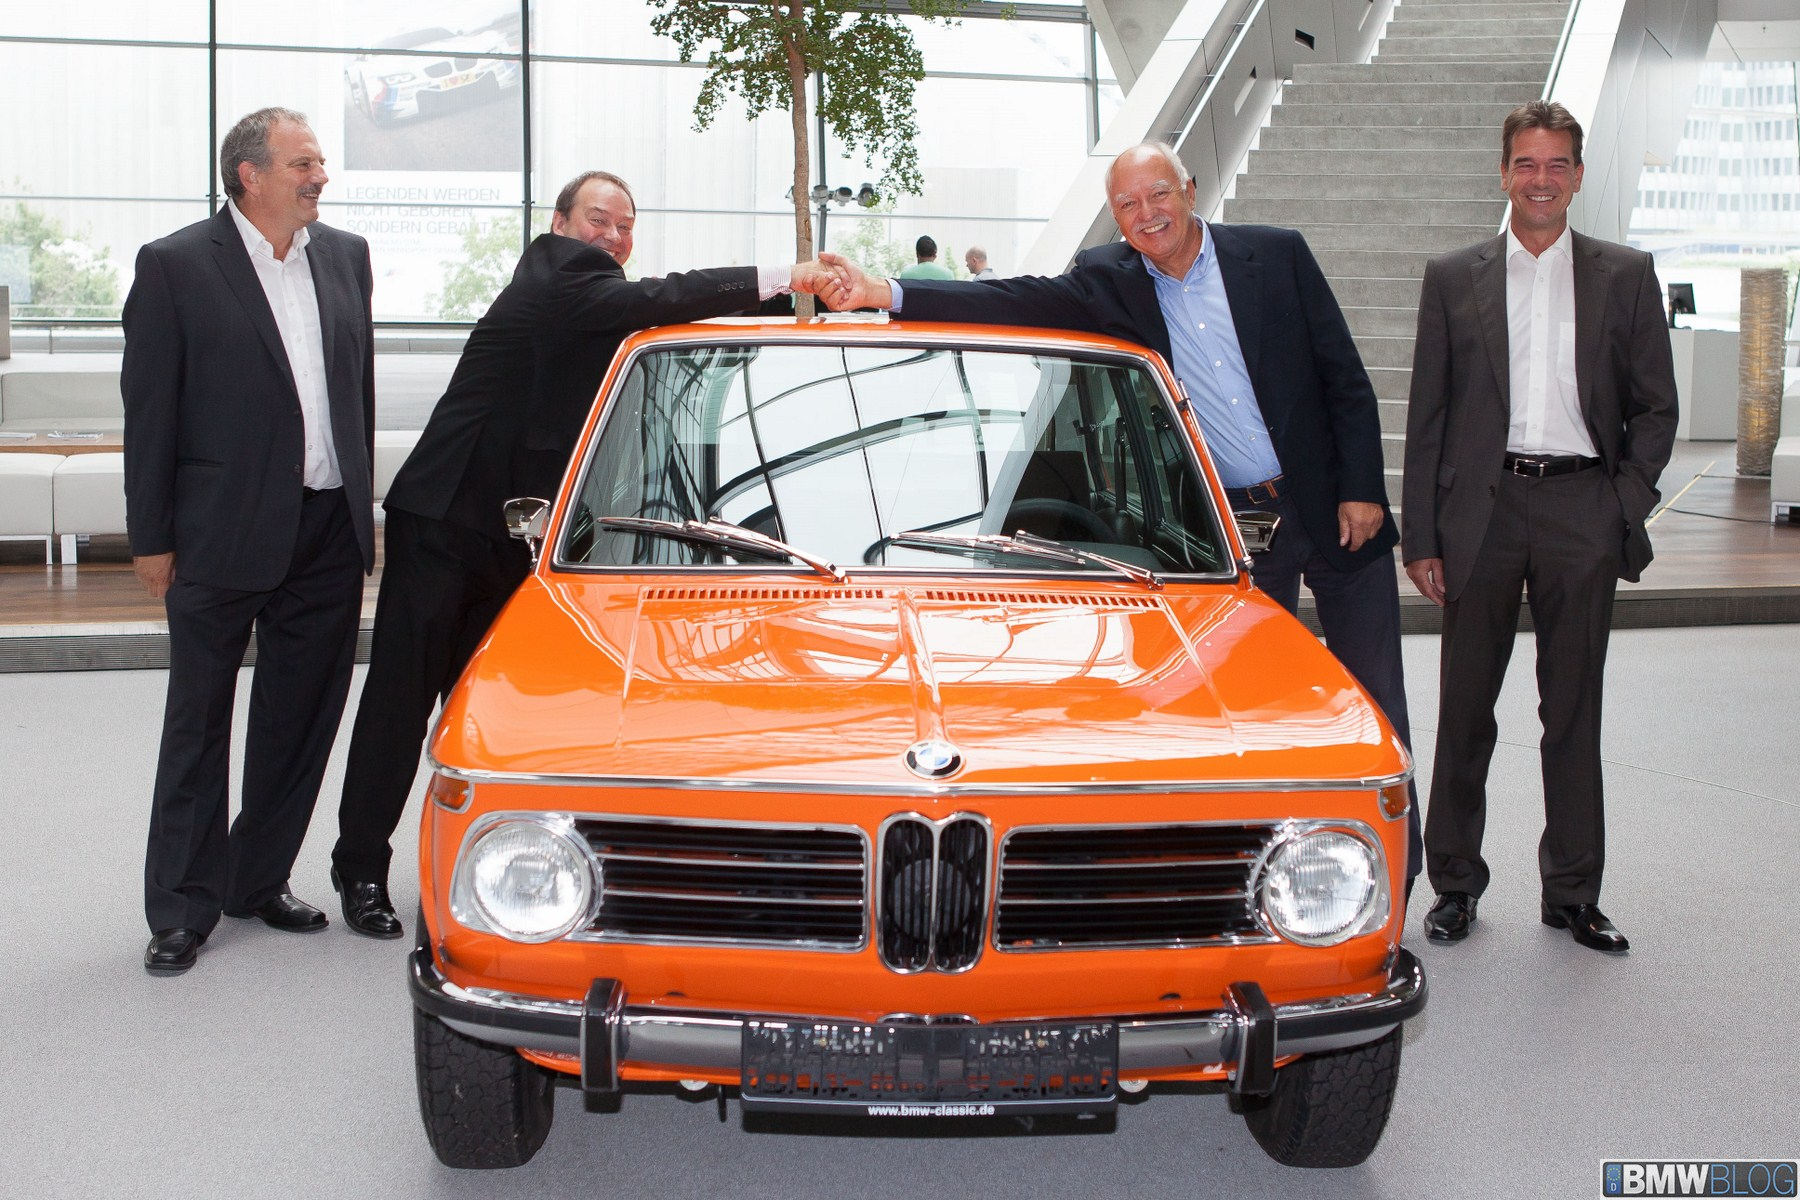 BMW Classic restores a 1972 BMW 2000 Touring